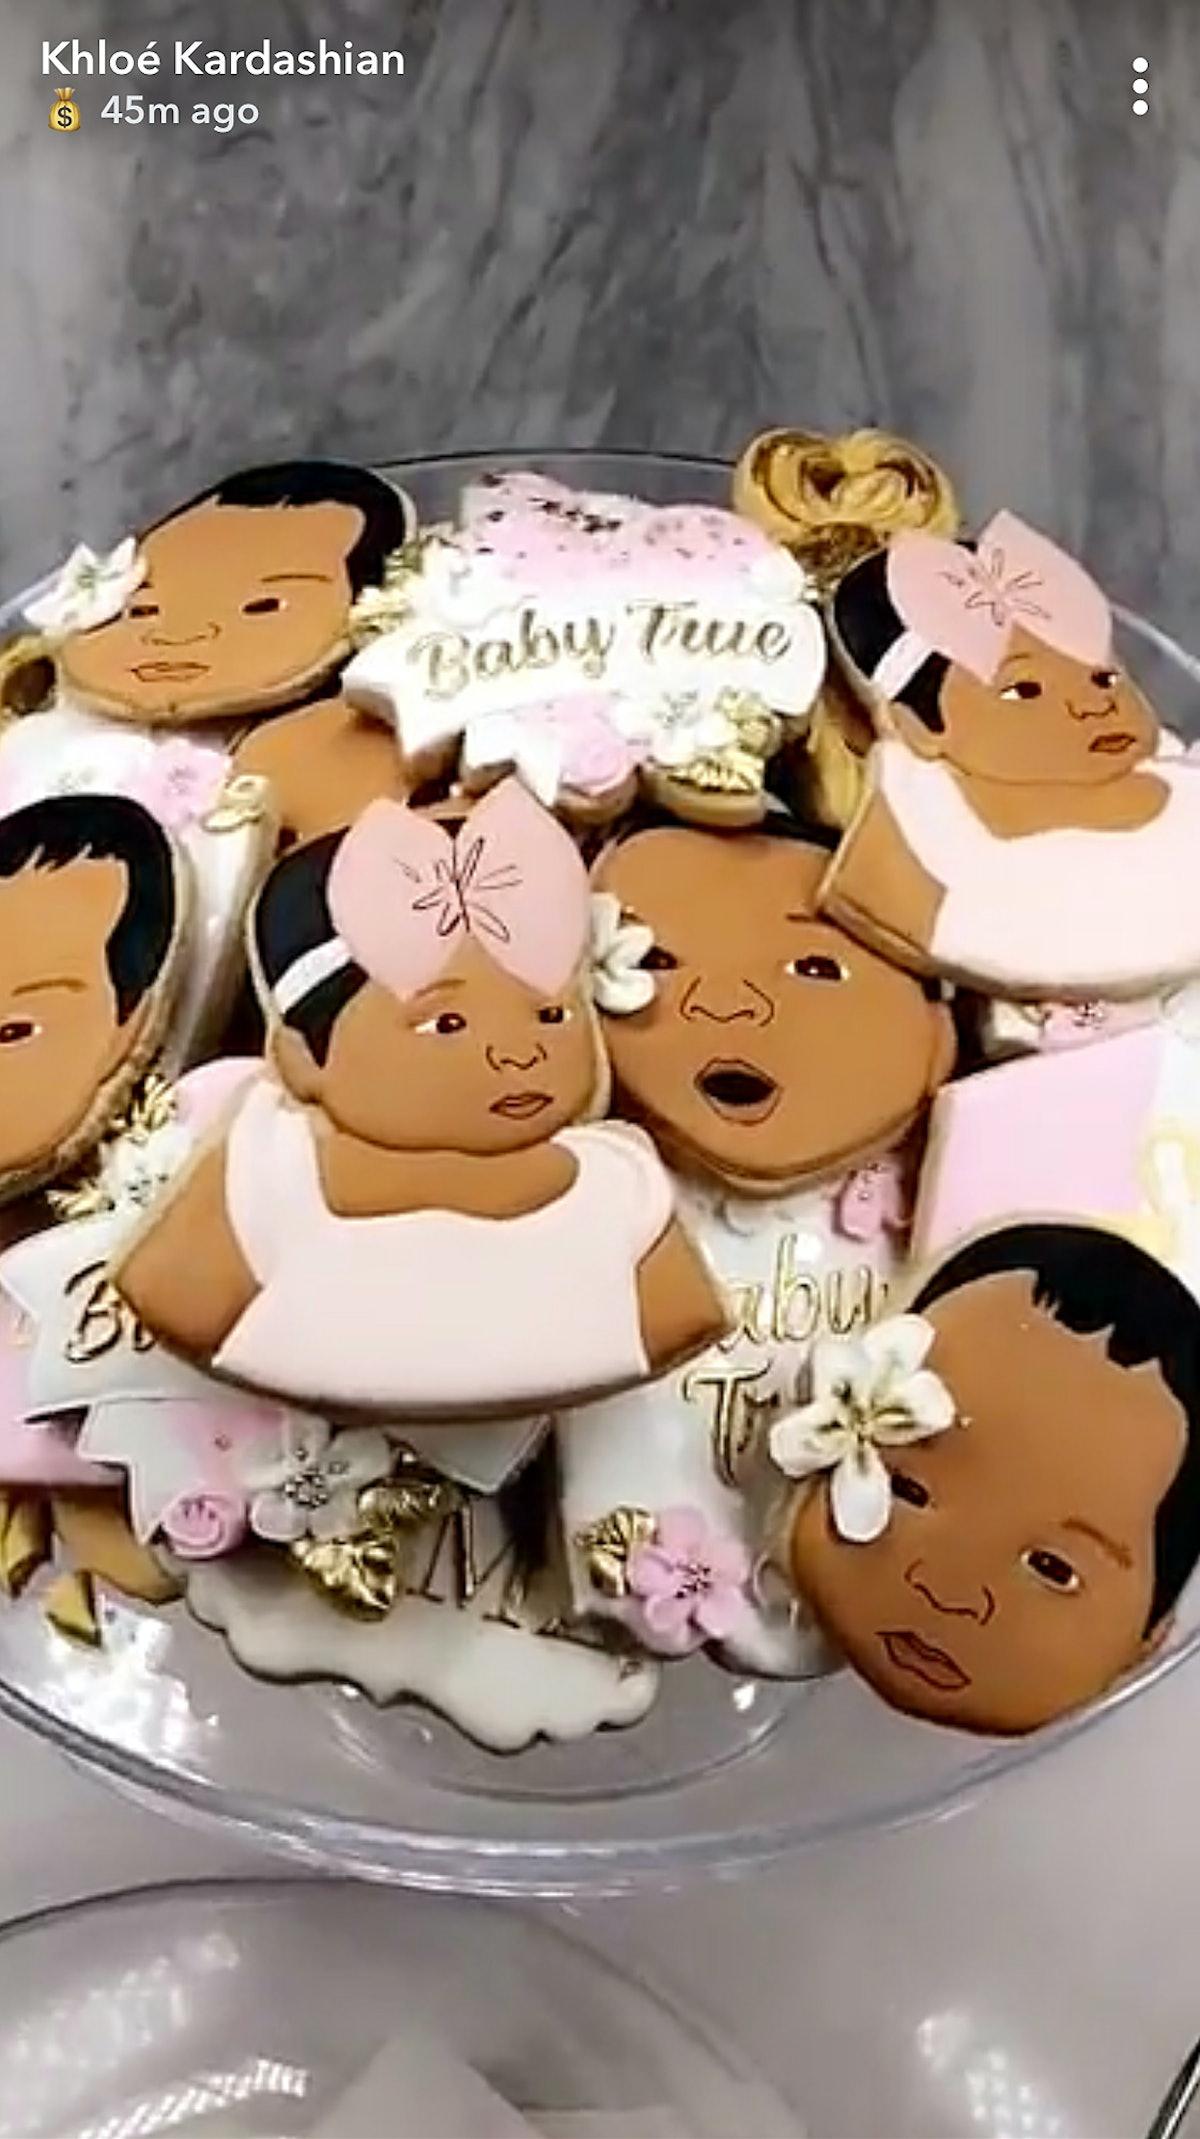 Khloe-Kardashian-Tristan-Thompson-Fathers-Day-True-Cookies-Snapchat.jpg